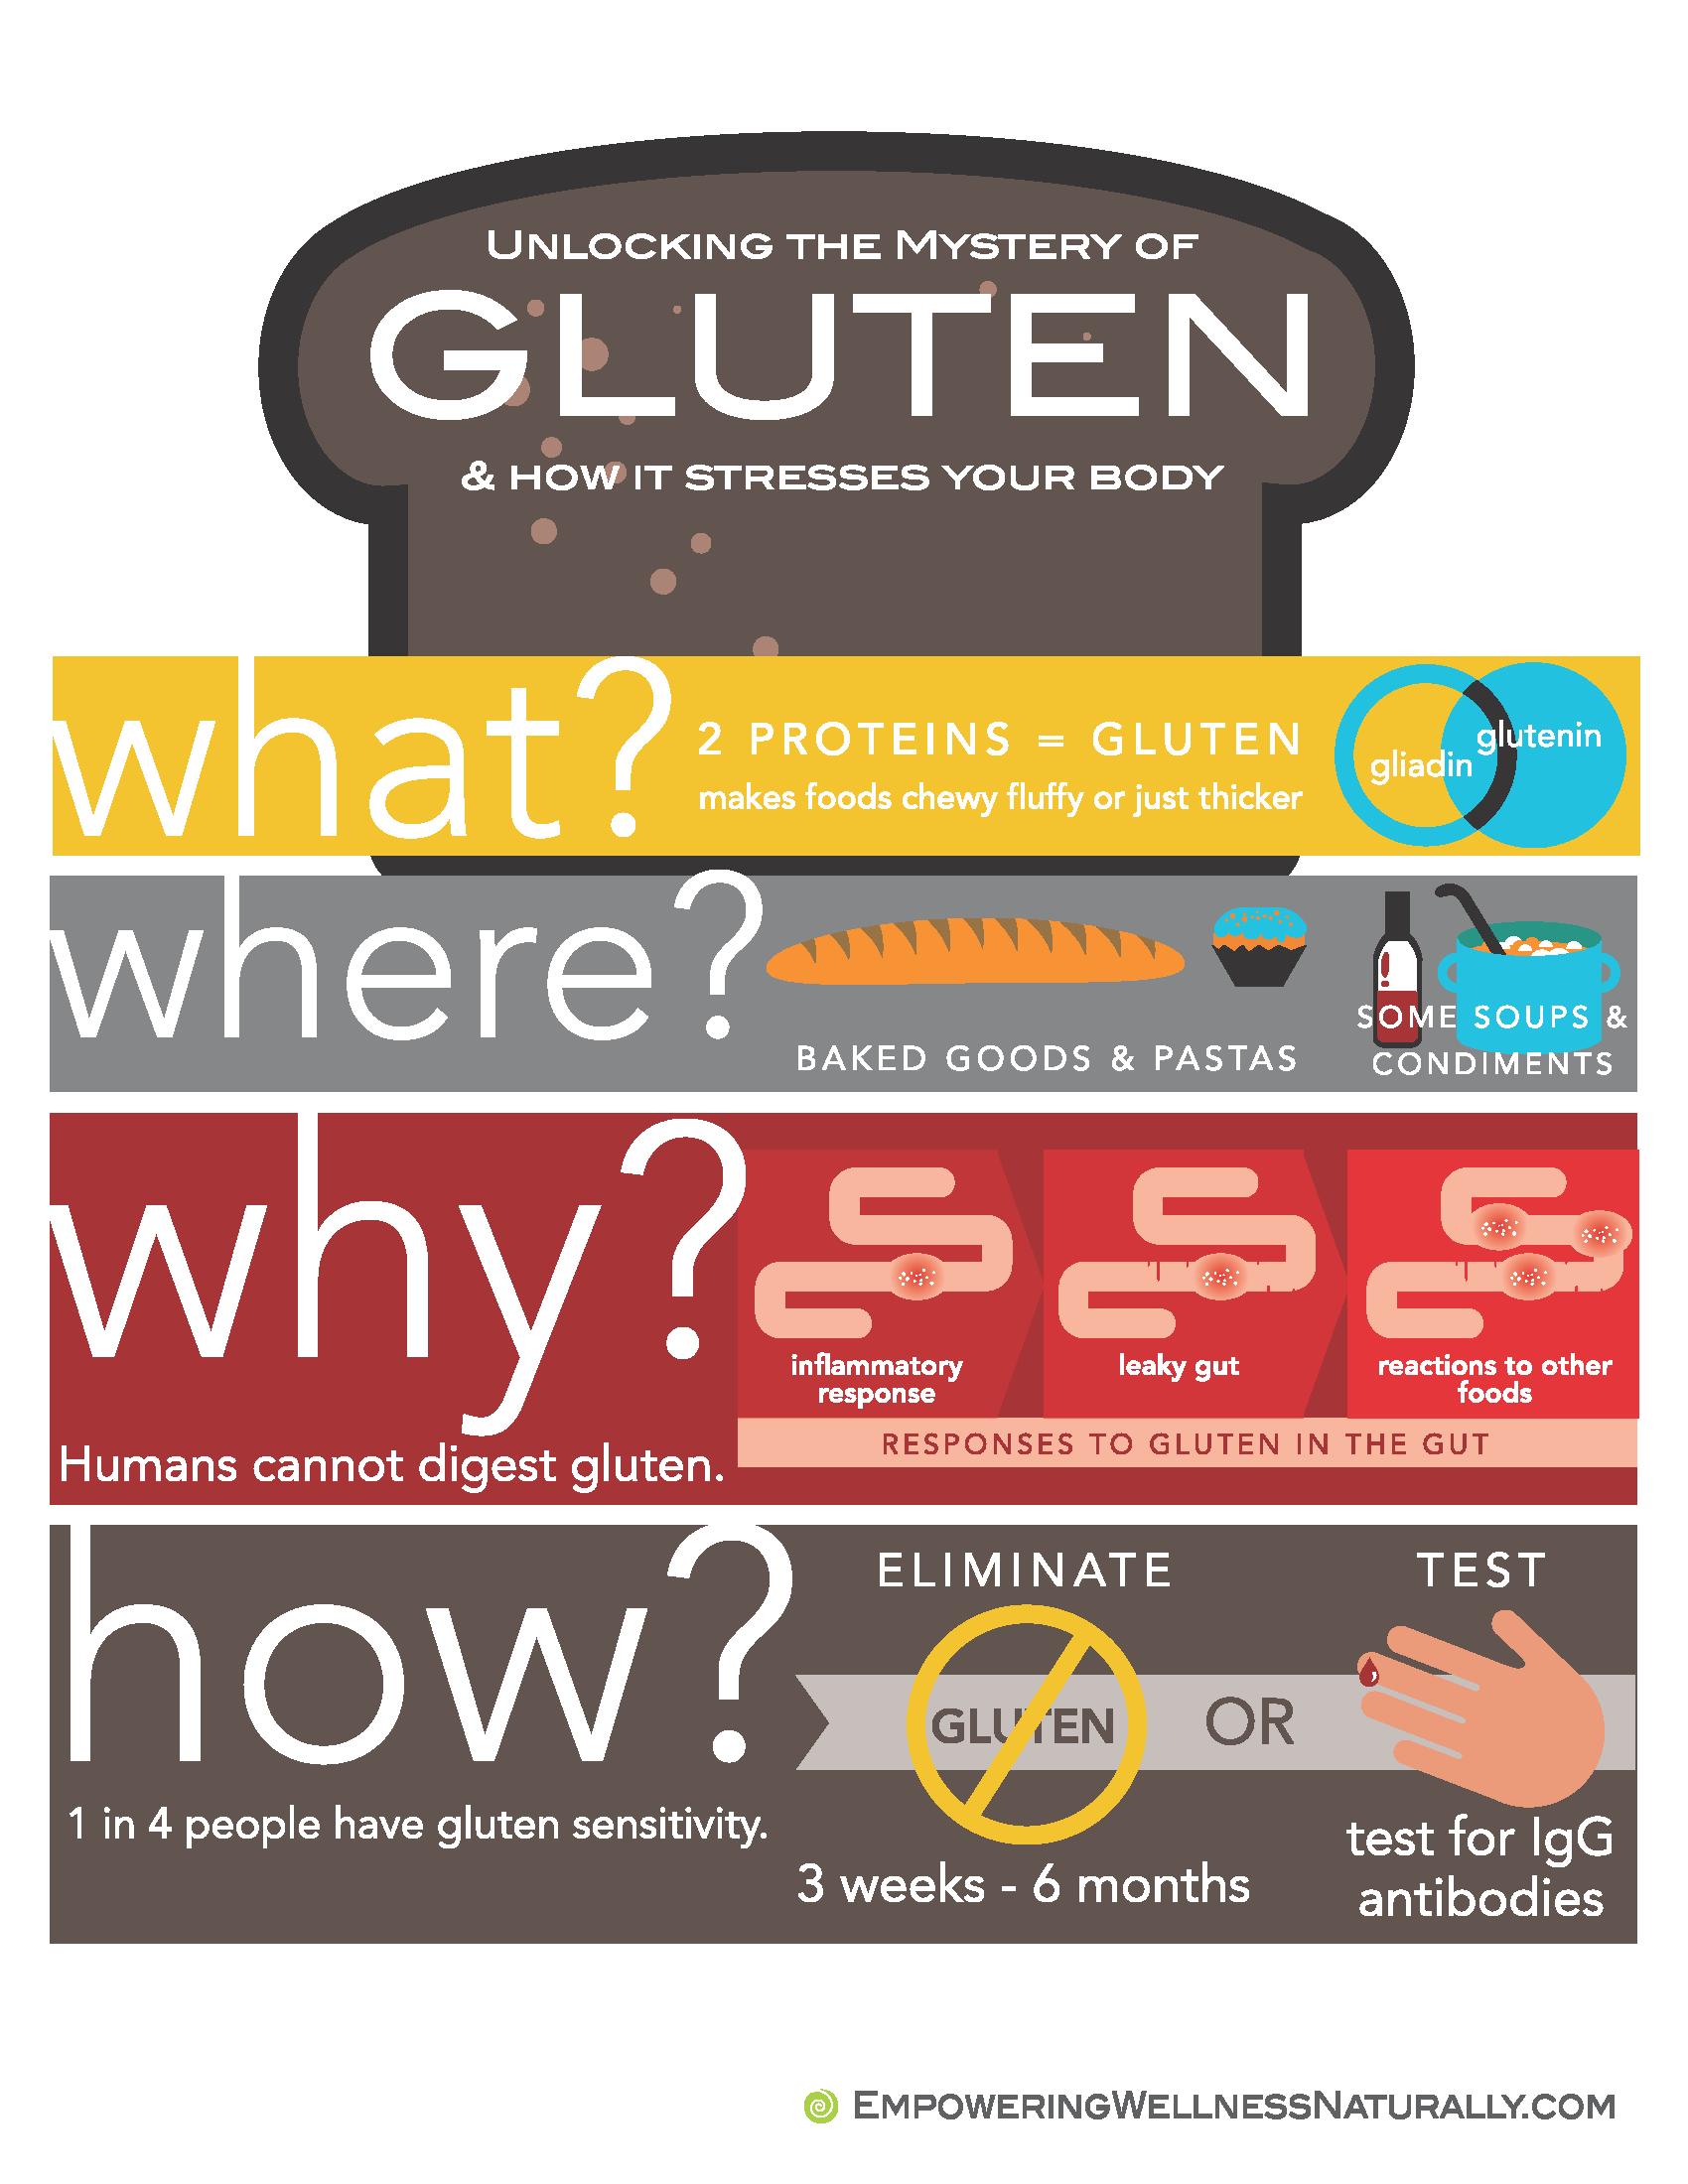 gluten, gluten-free, gluten intolerance